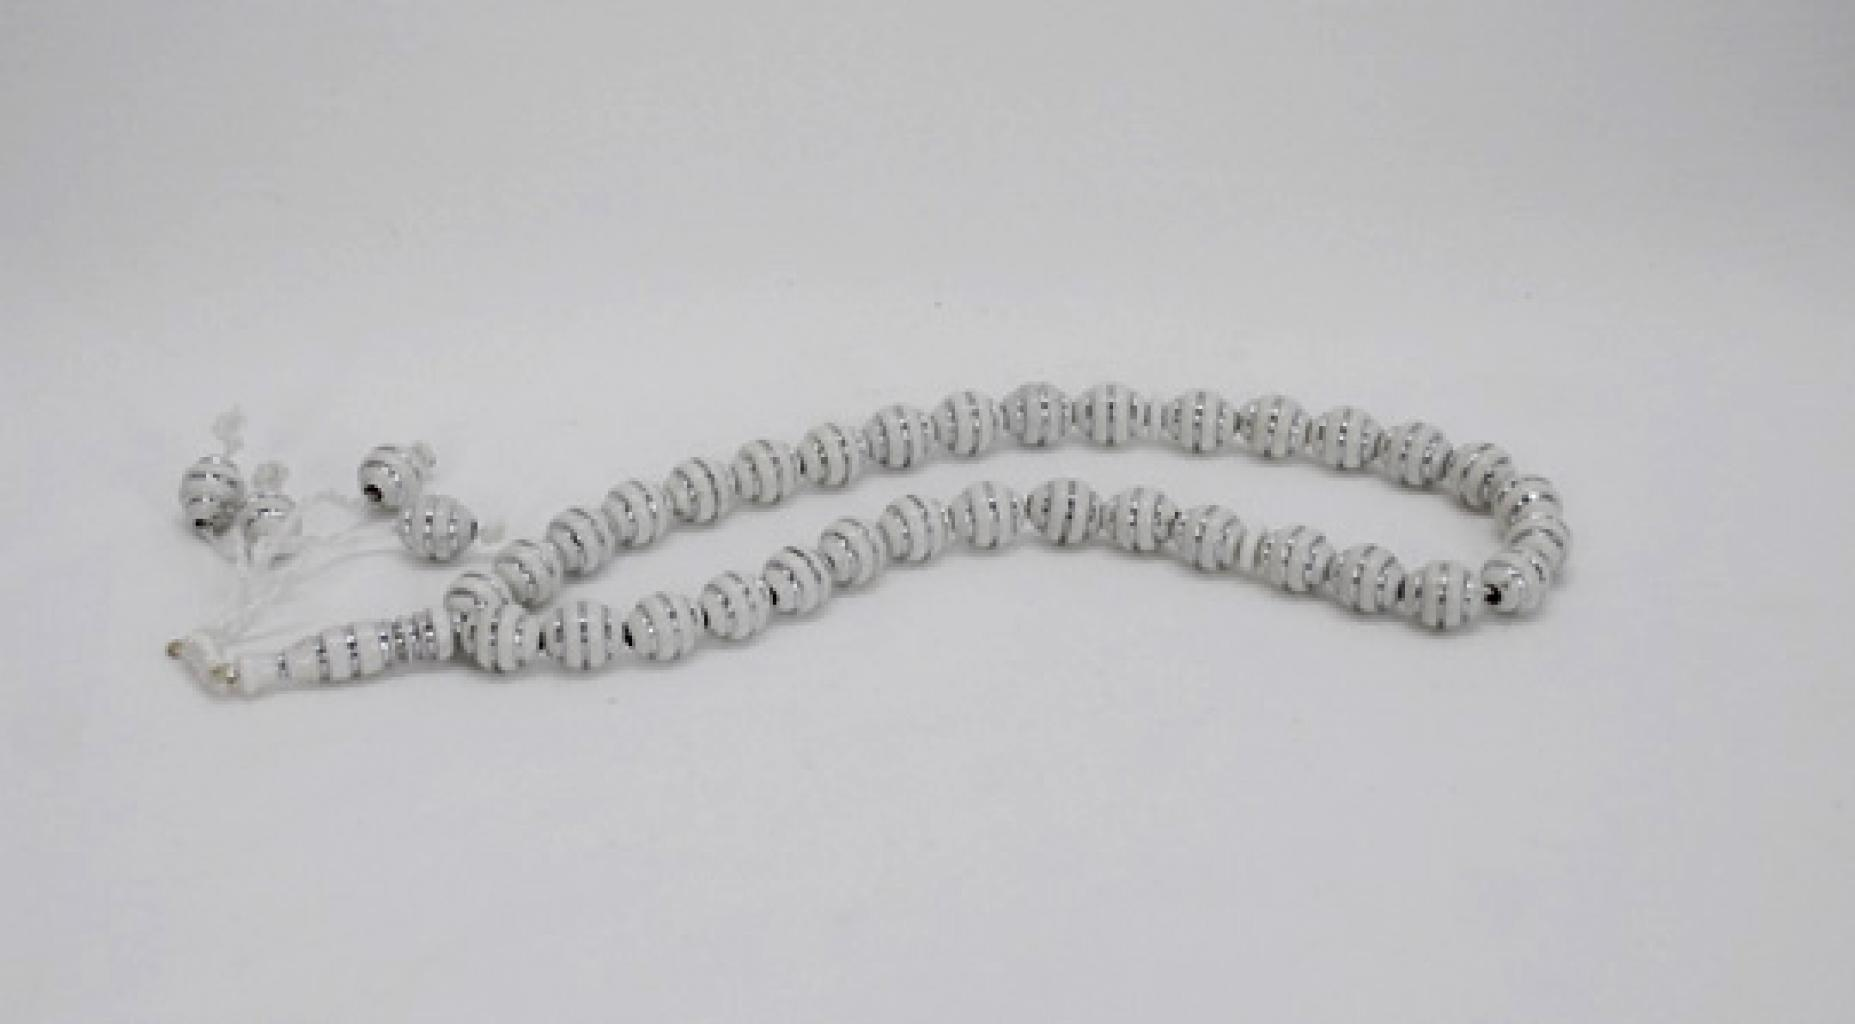 Prayer Beads with Textured Design ii889